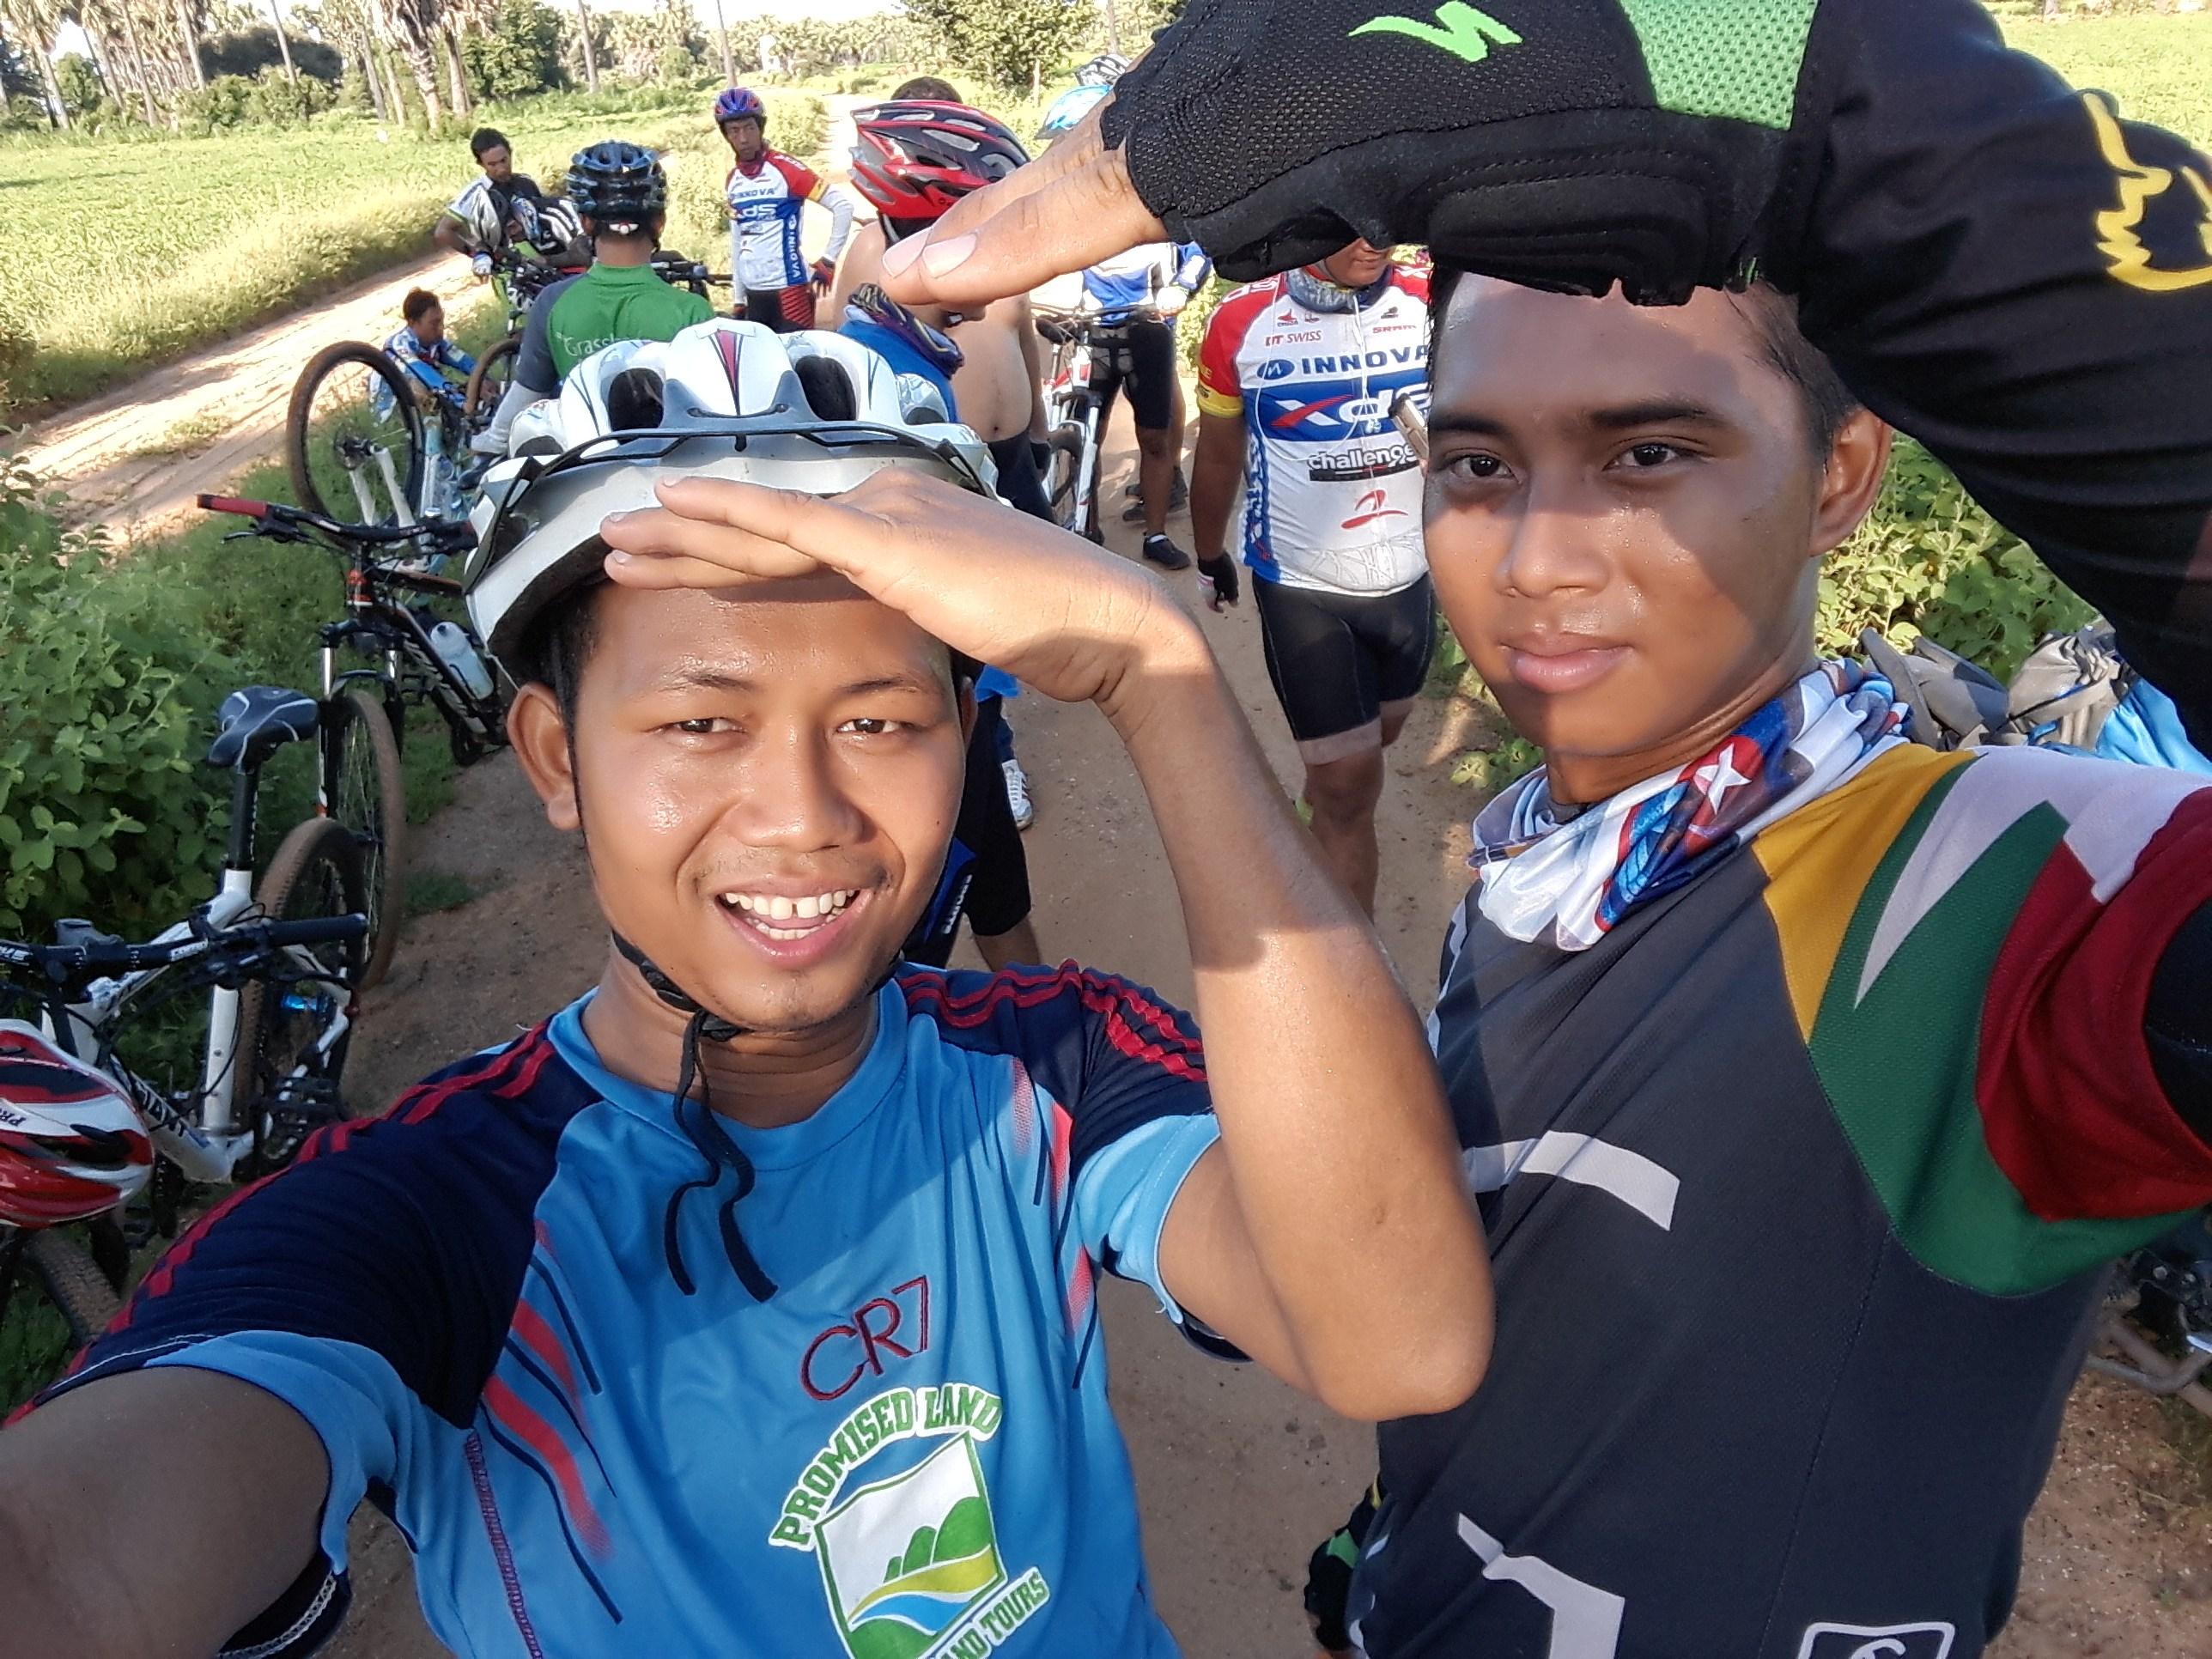 Relish the experience of mountain biking